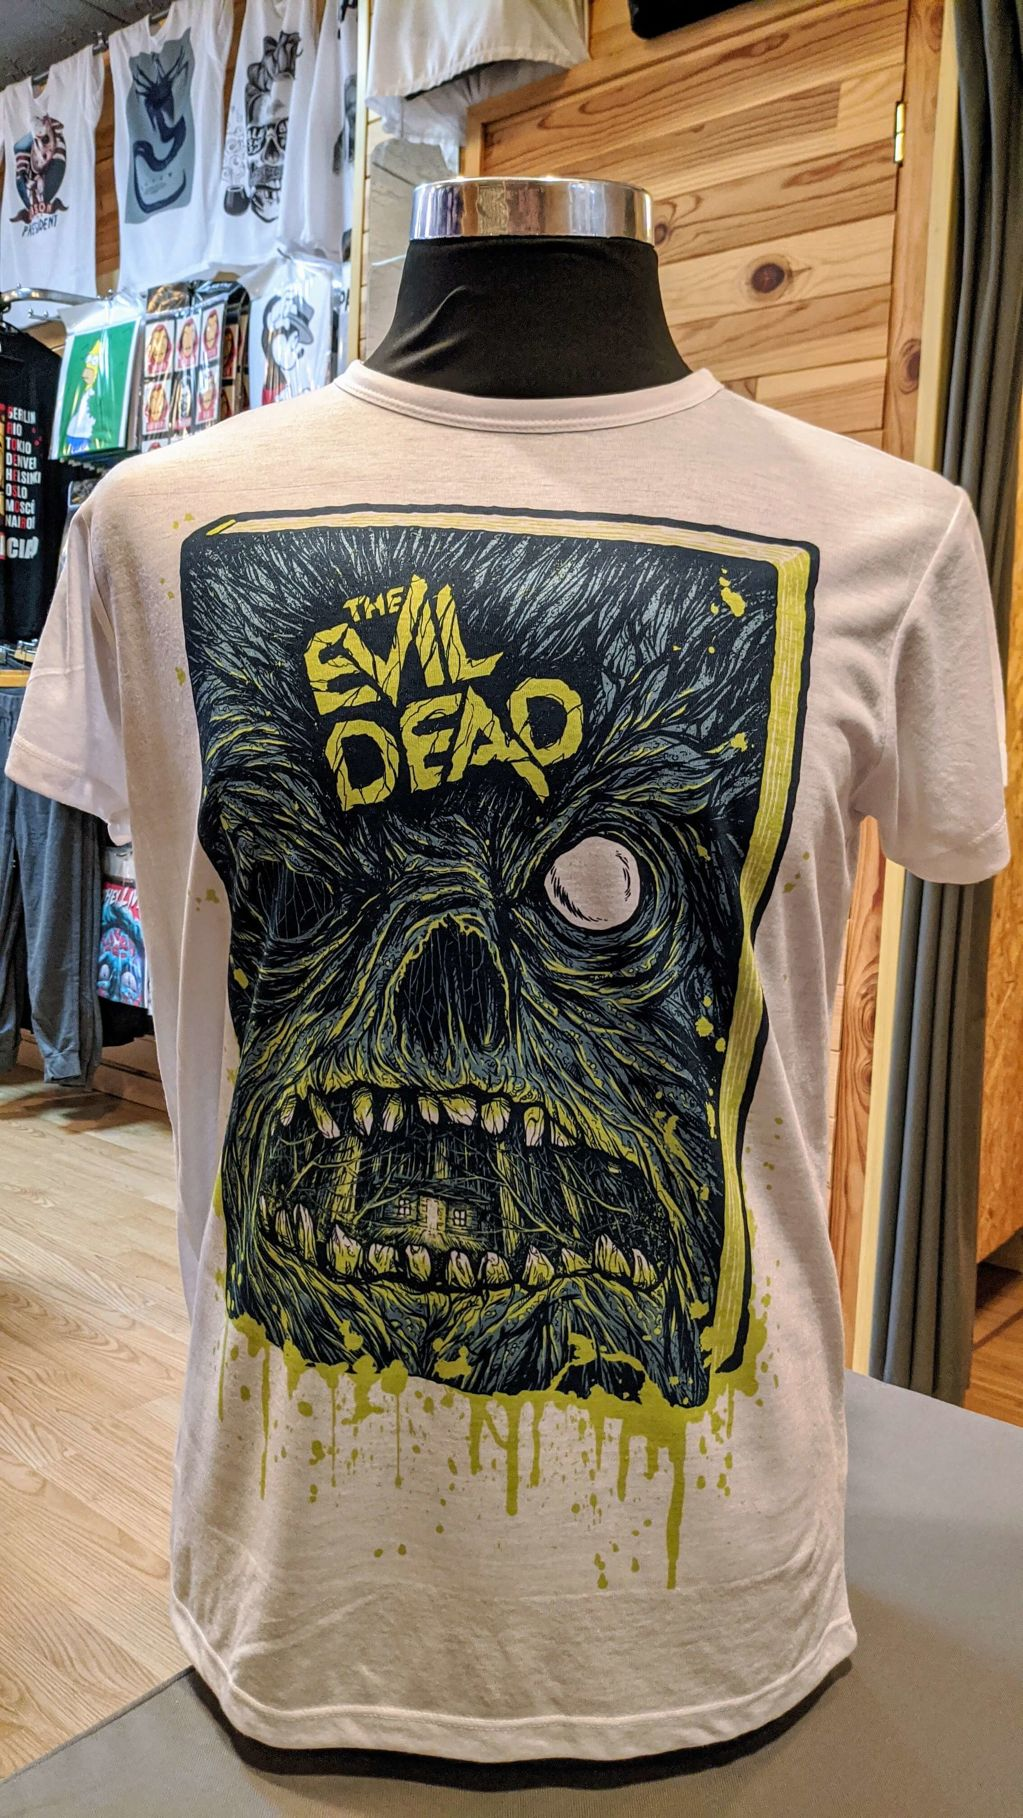 The Evil Dead - a8ffa-camiseta-evil-dead.jpg